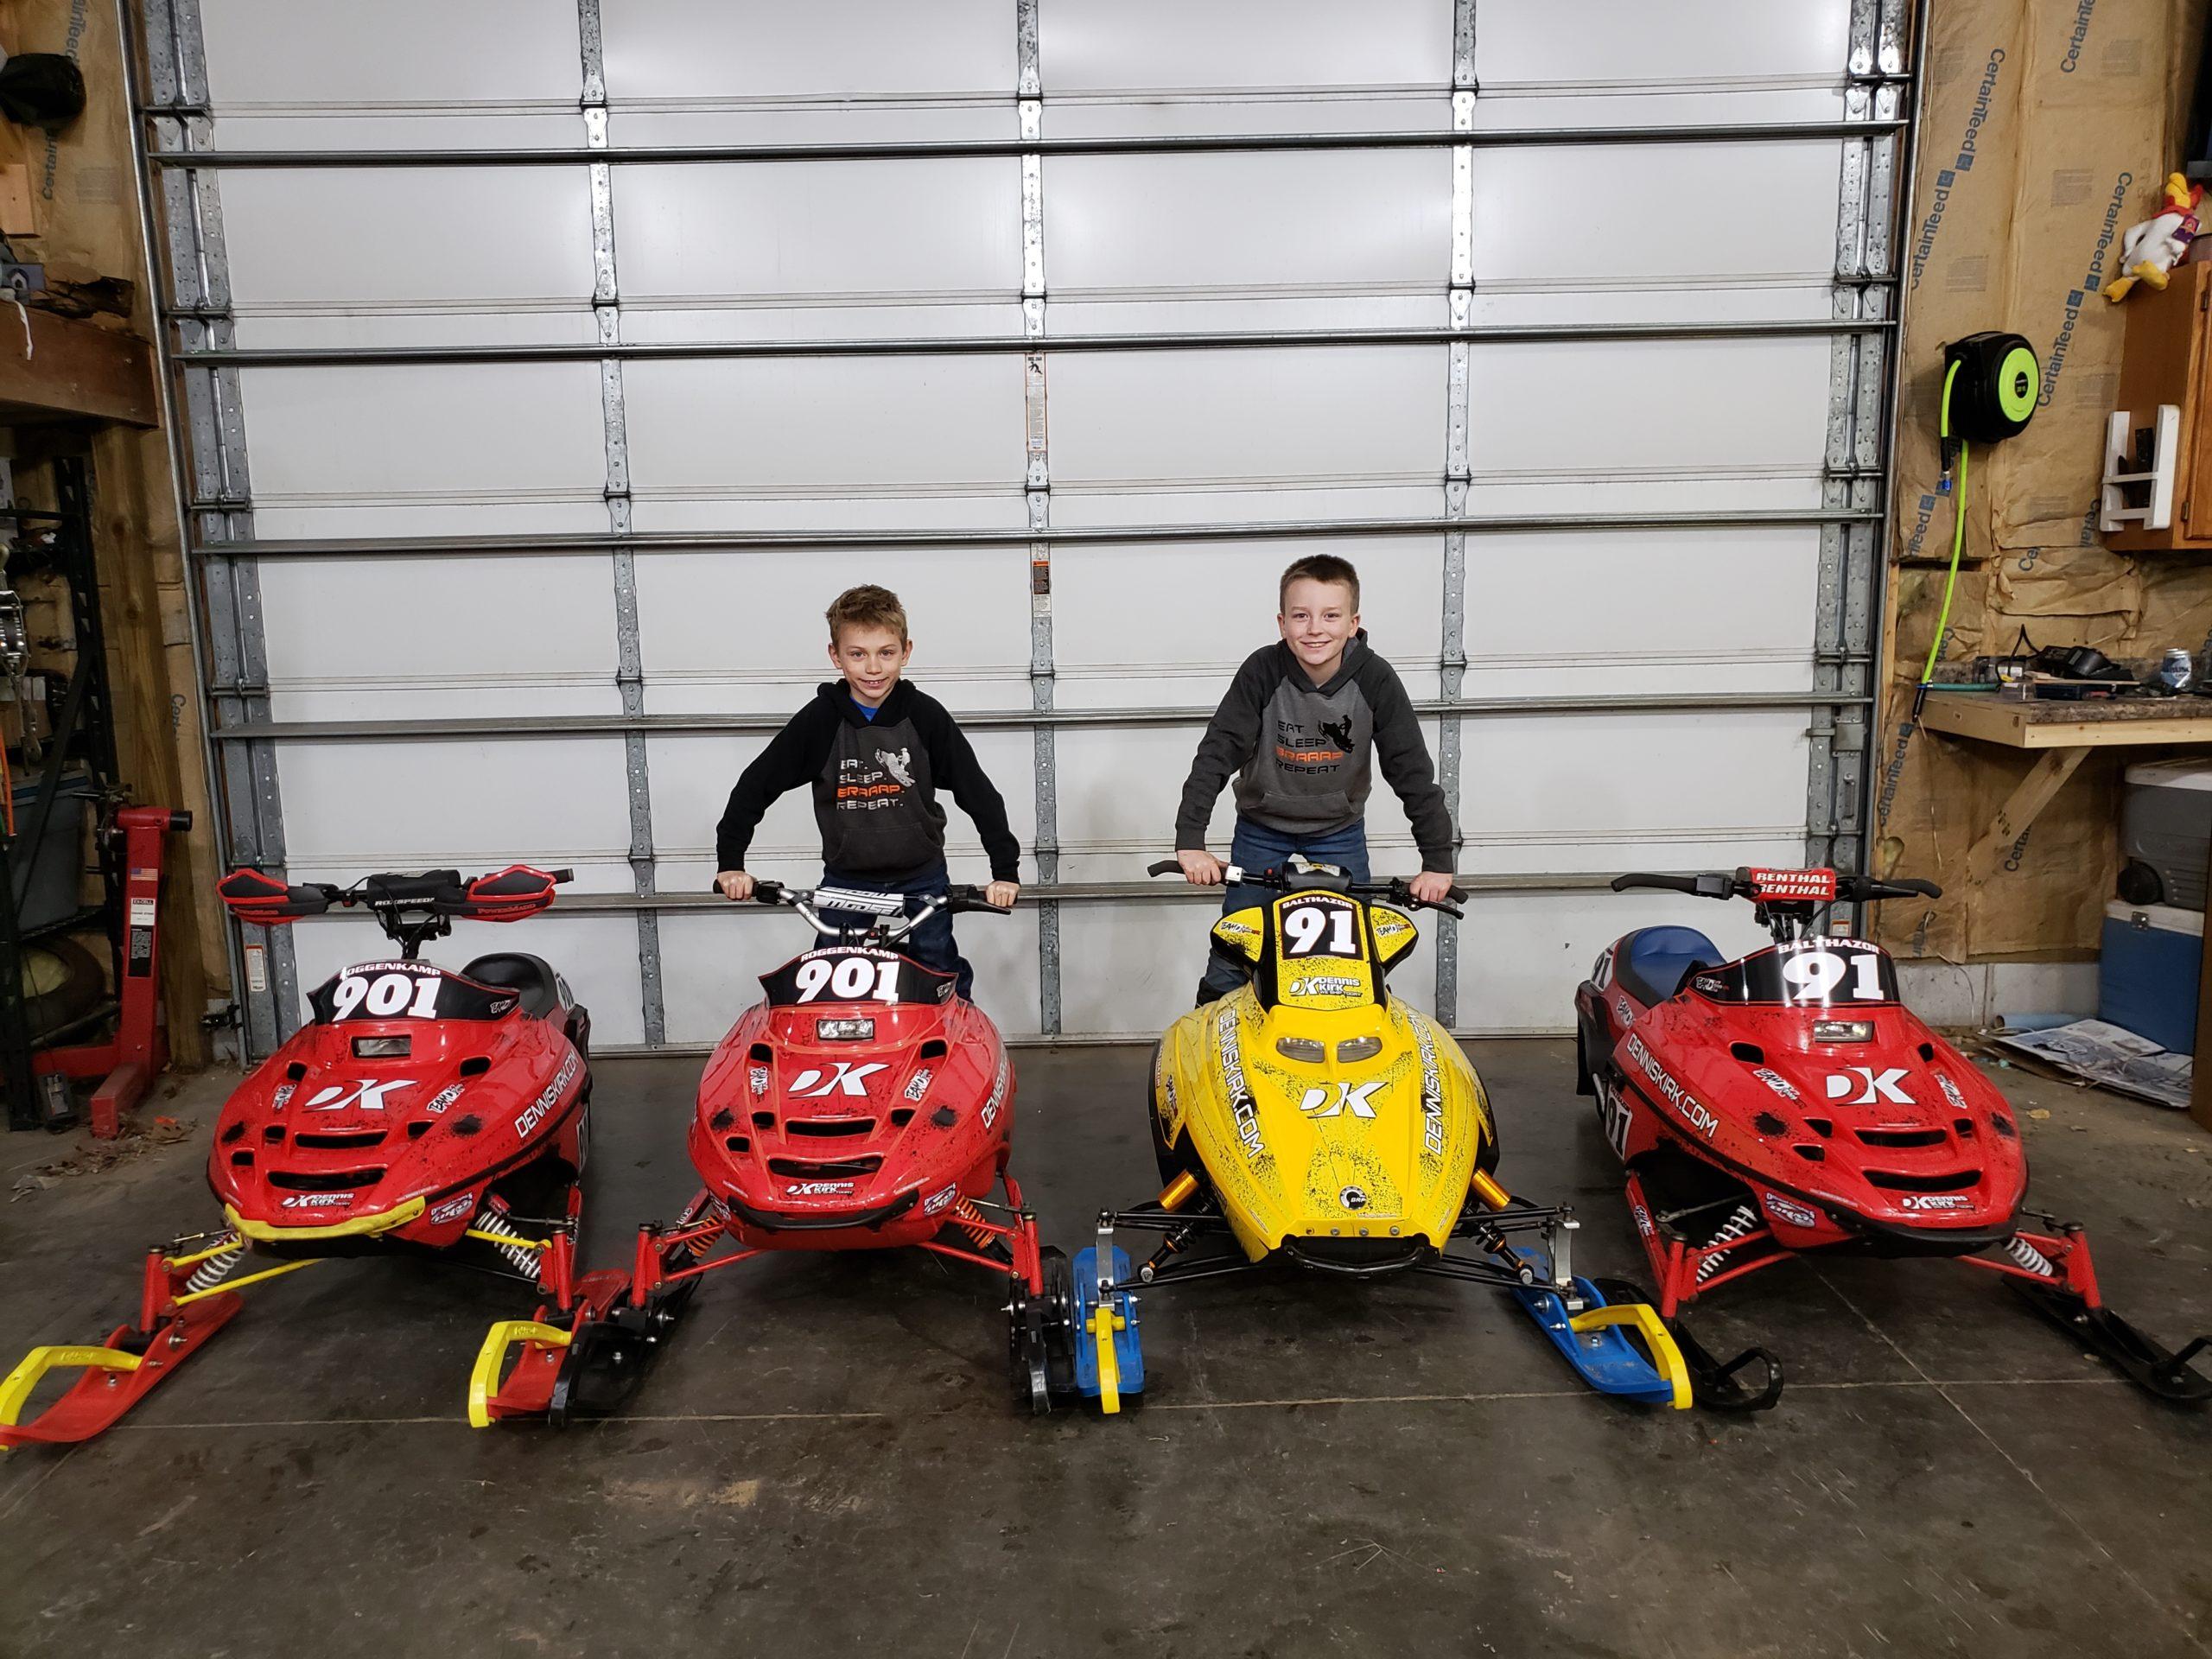 Kids on Snowmobiles